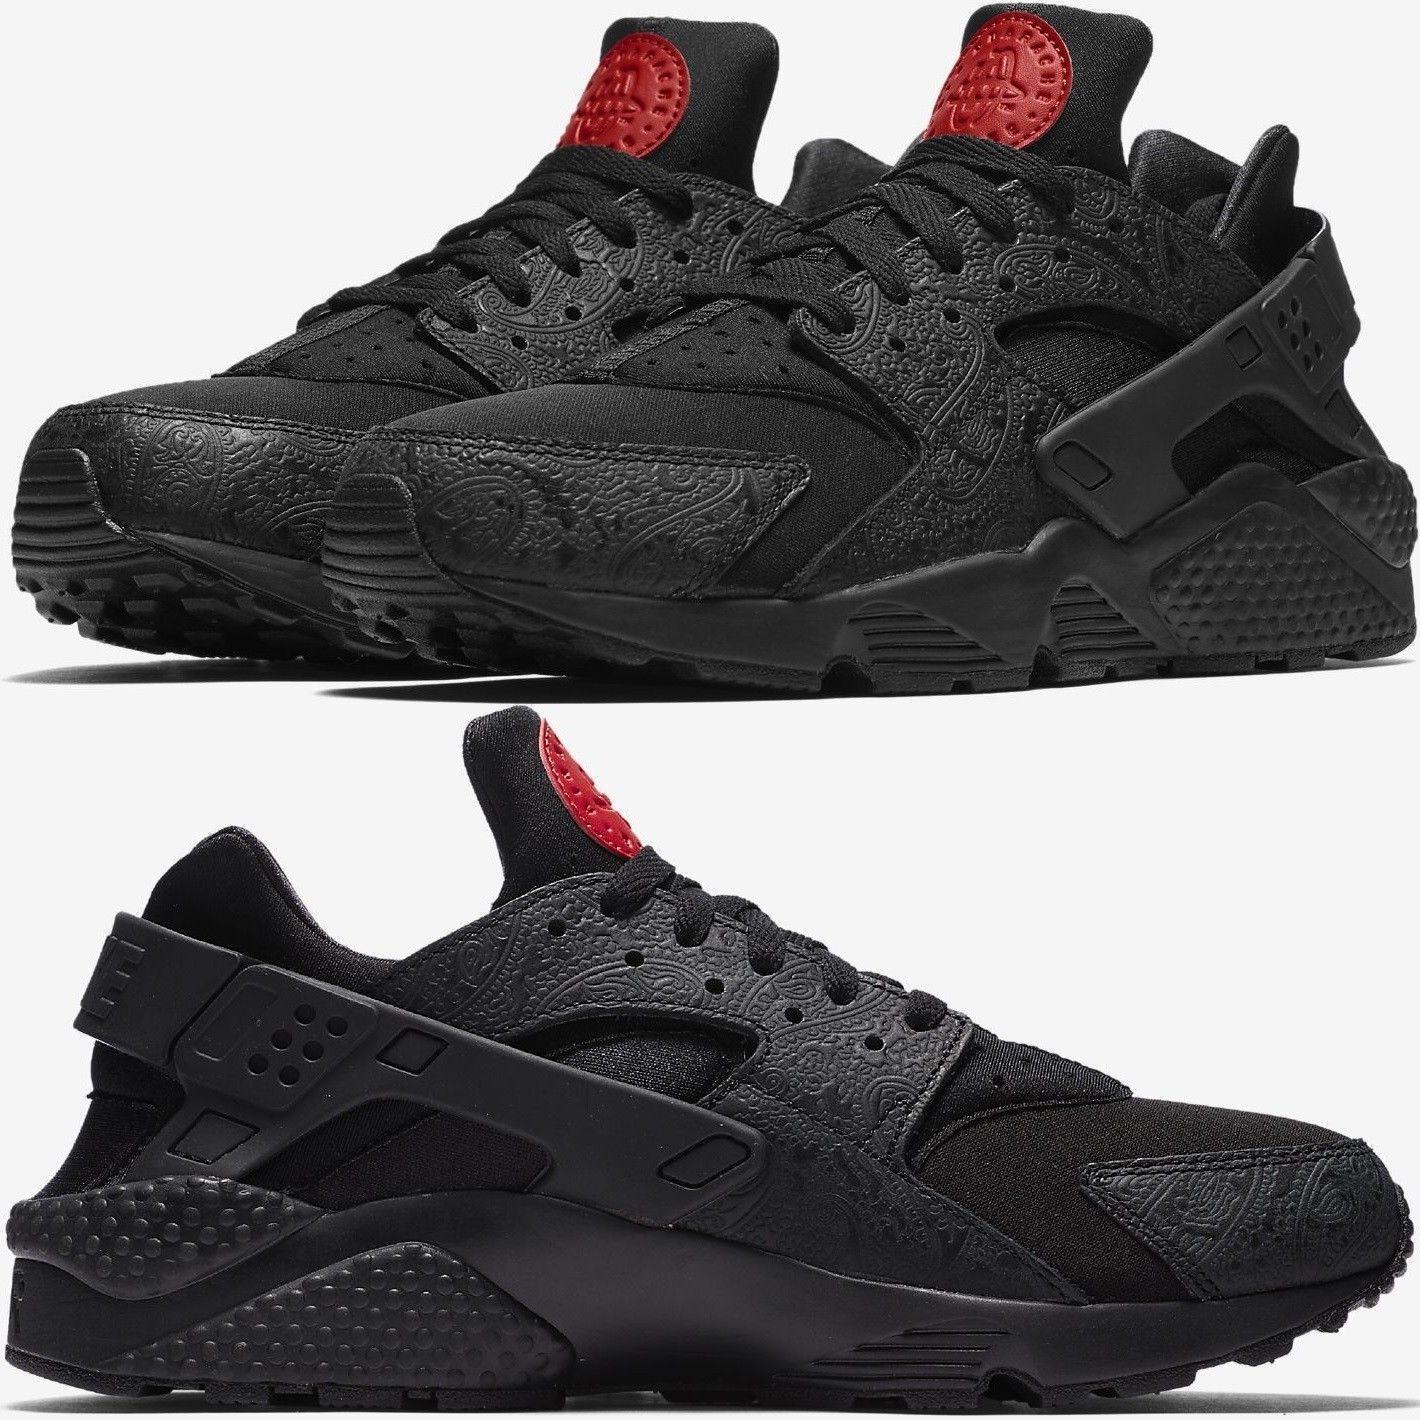 Ao3153 001 Men's Nike Air Huarache Run